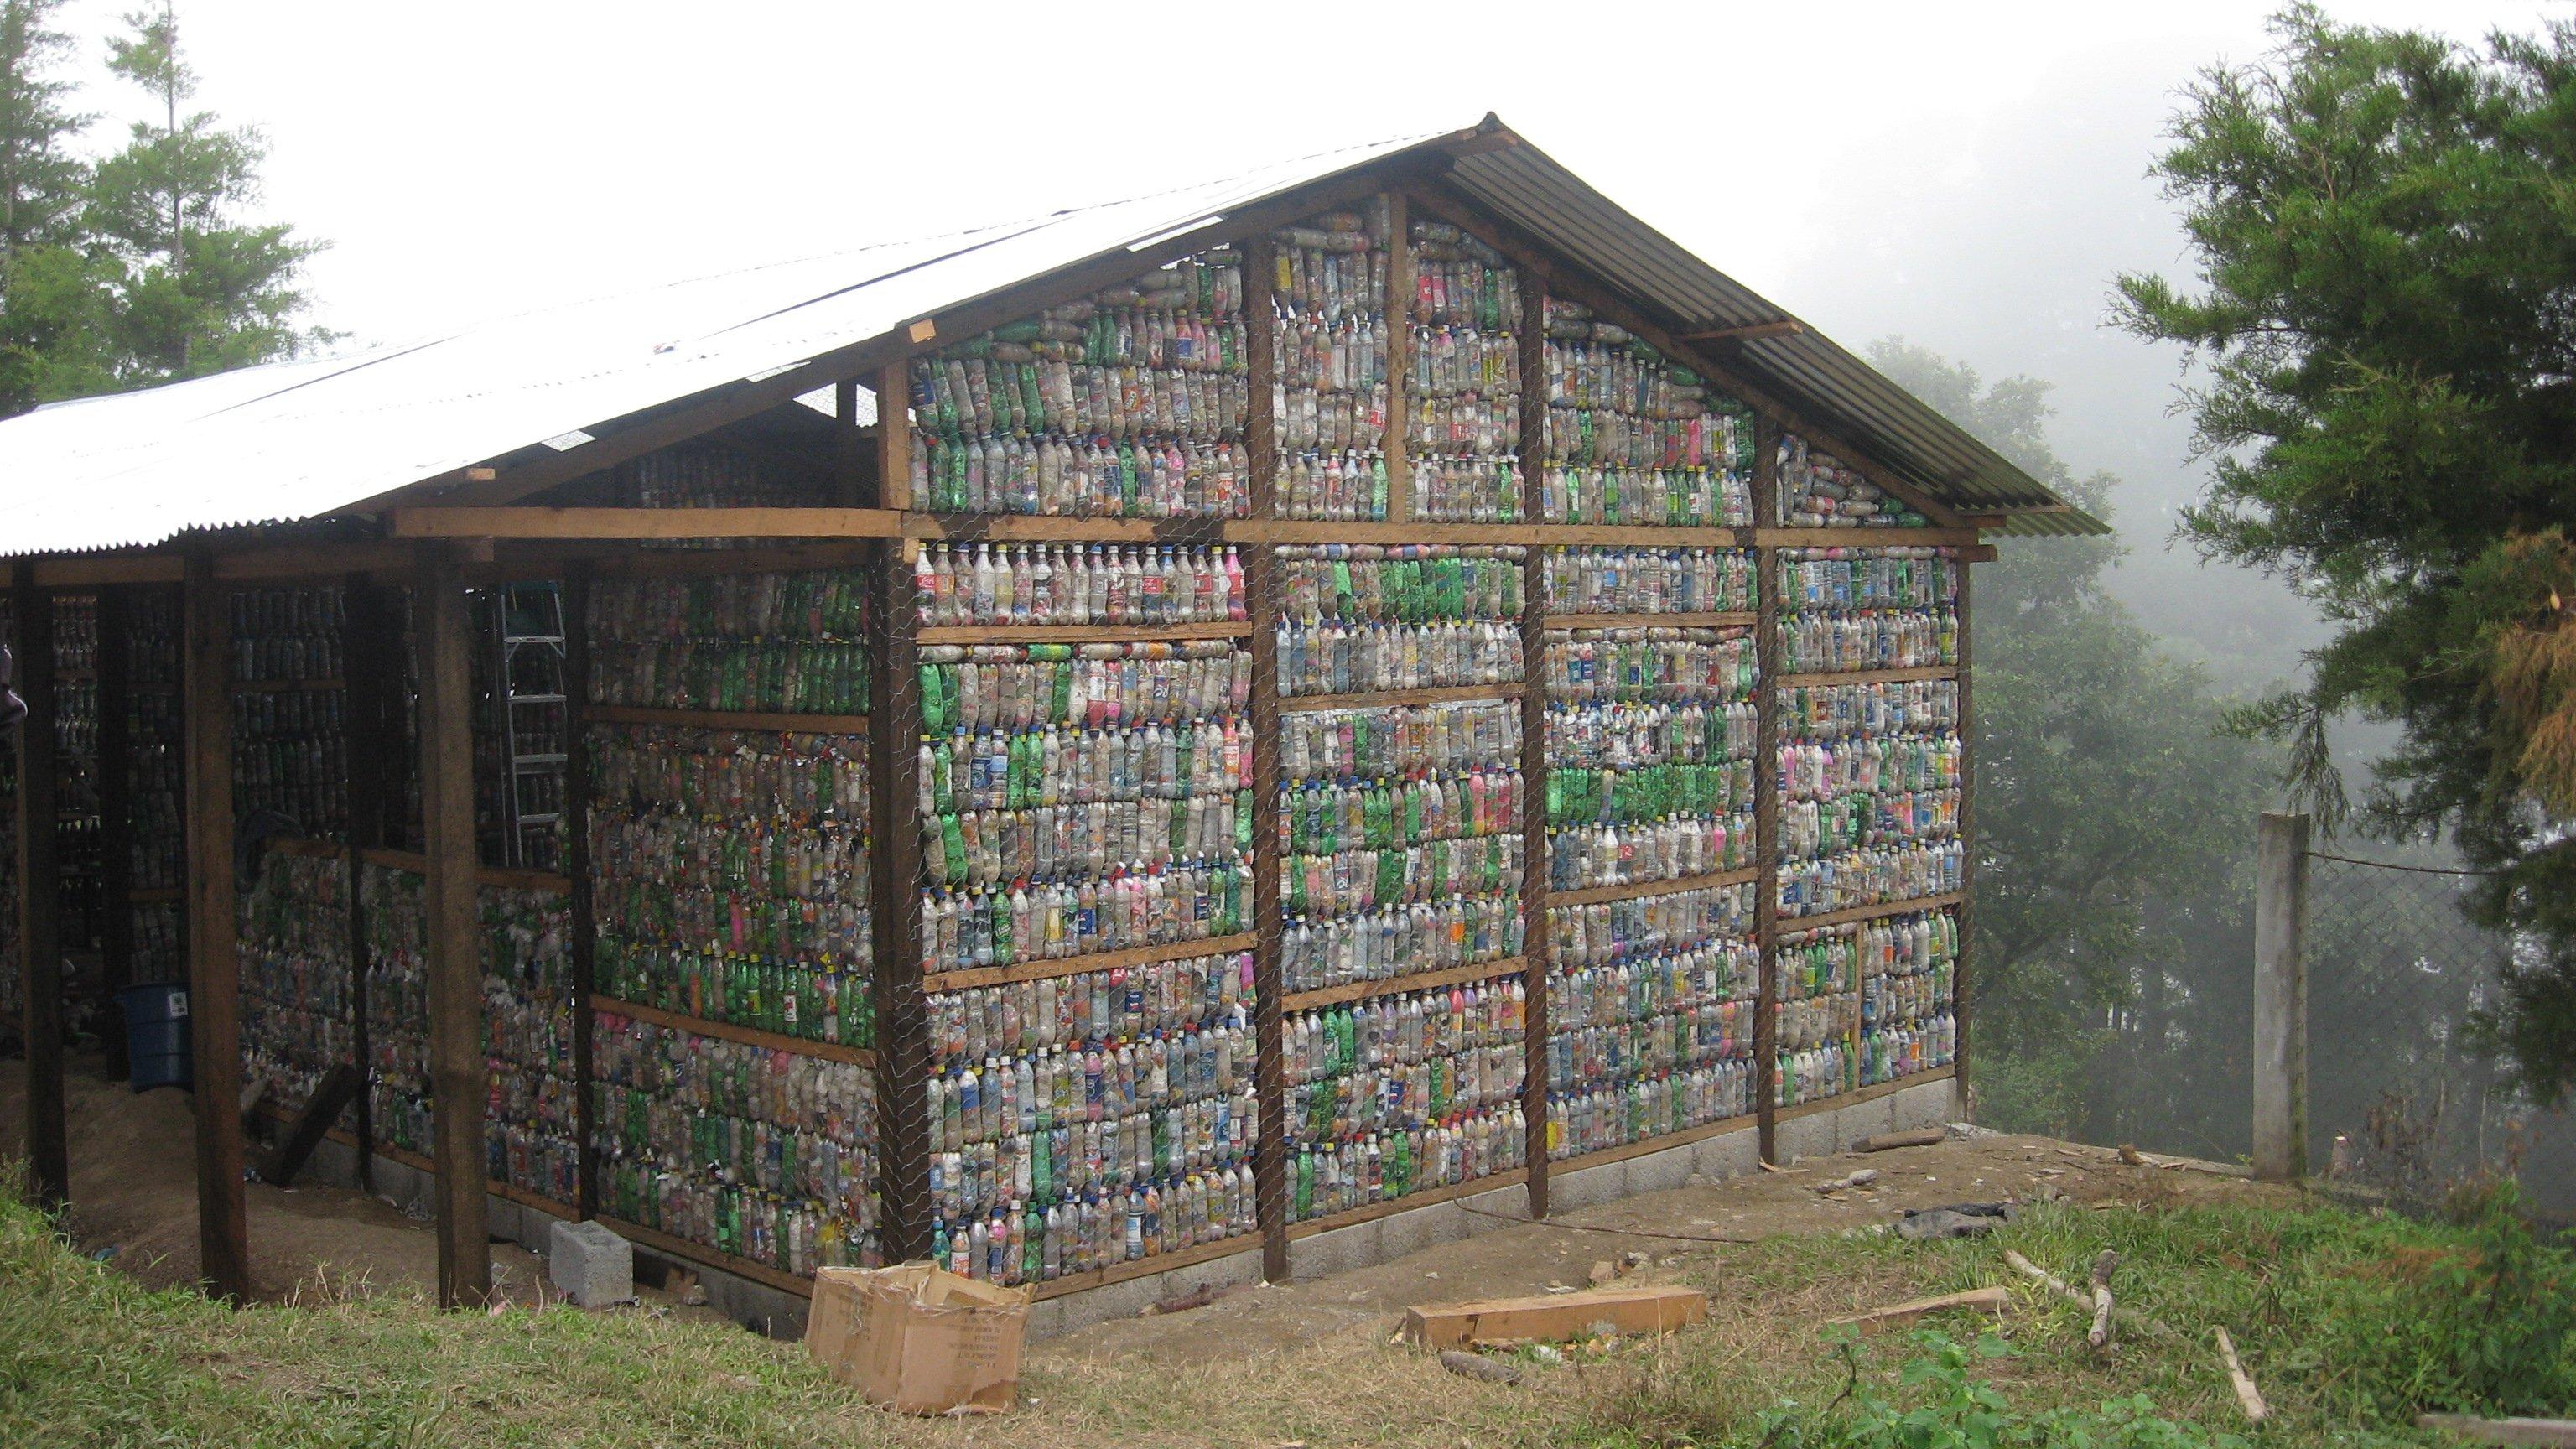 Ideas Para Reciclar Y Reutilizar Objetos Viejos De Tu Hogar